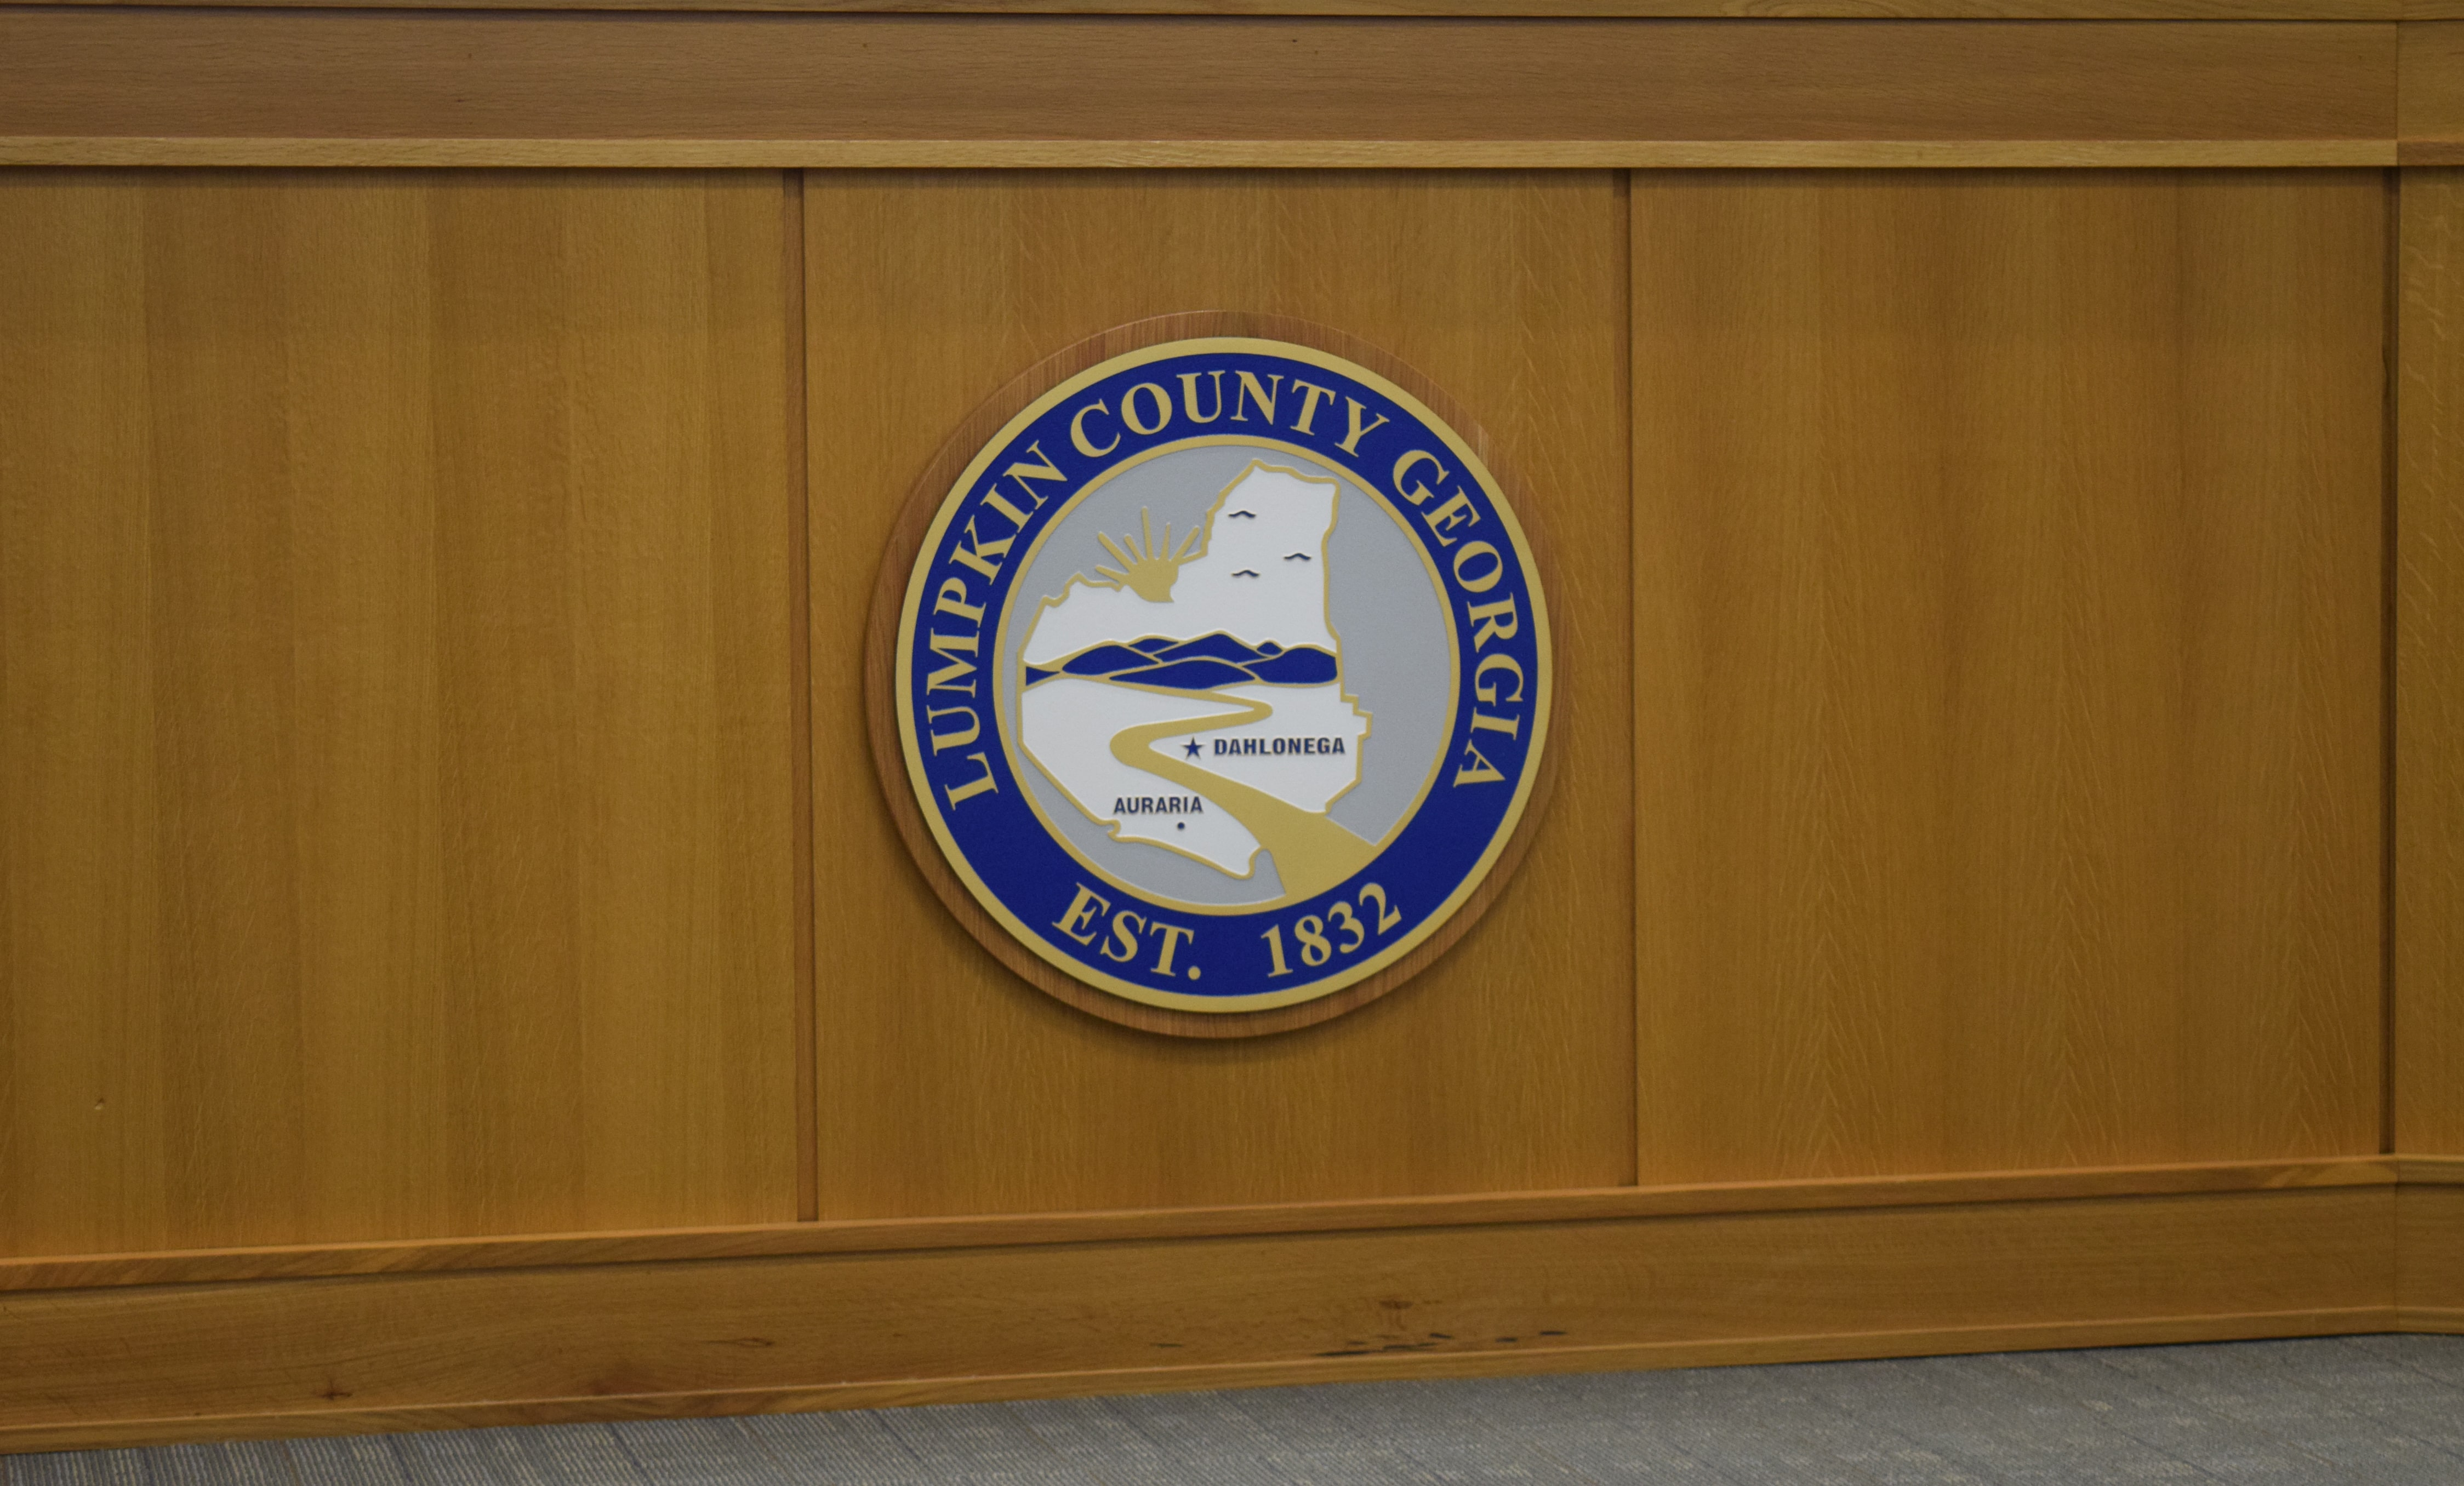 Broadband Q&A: Lumpkin County